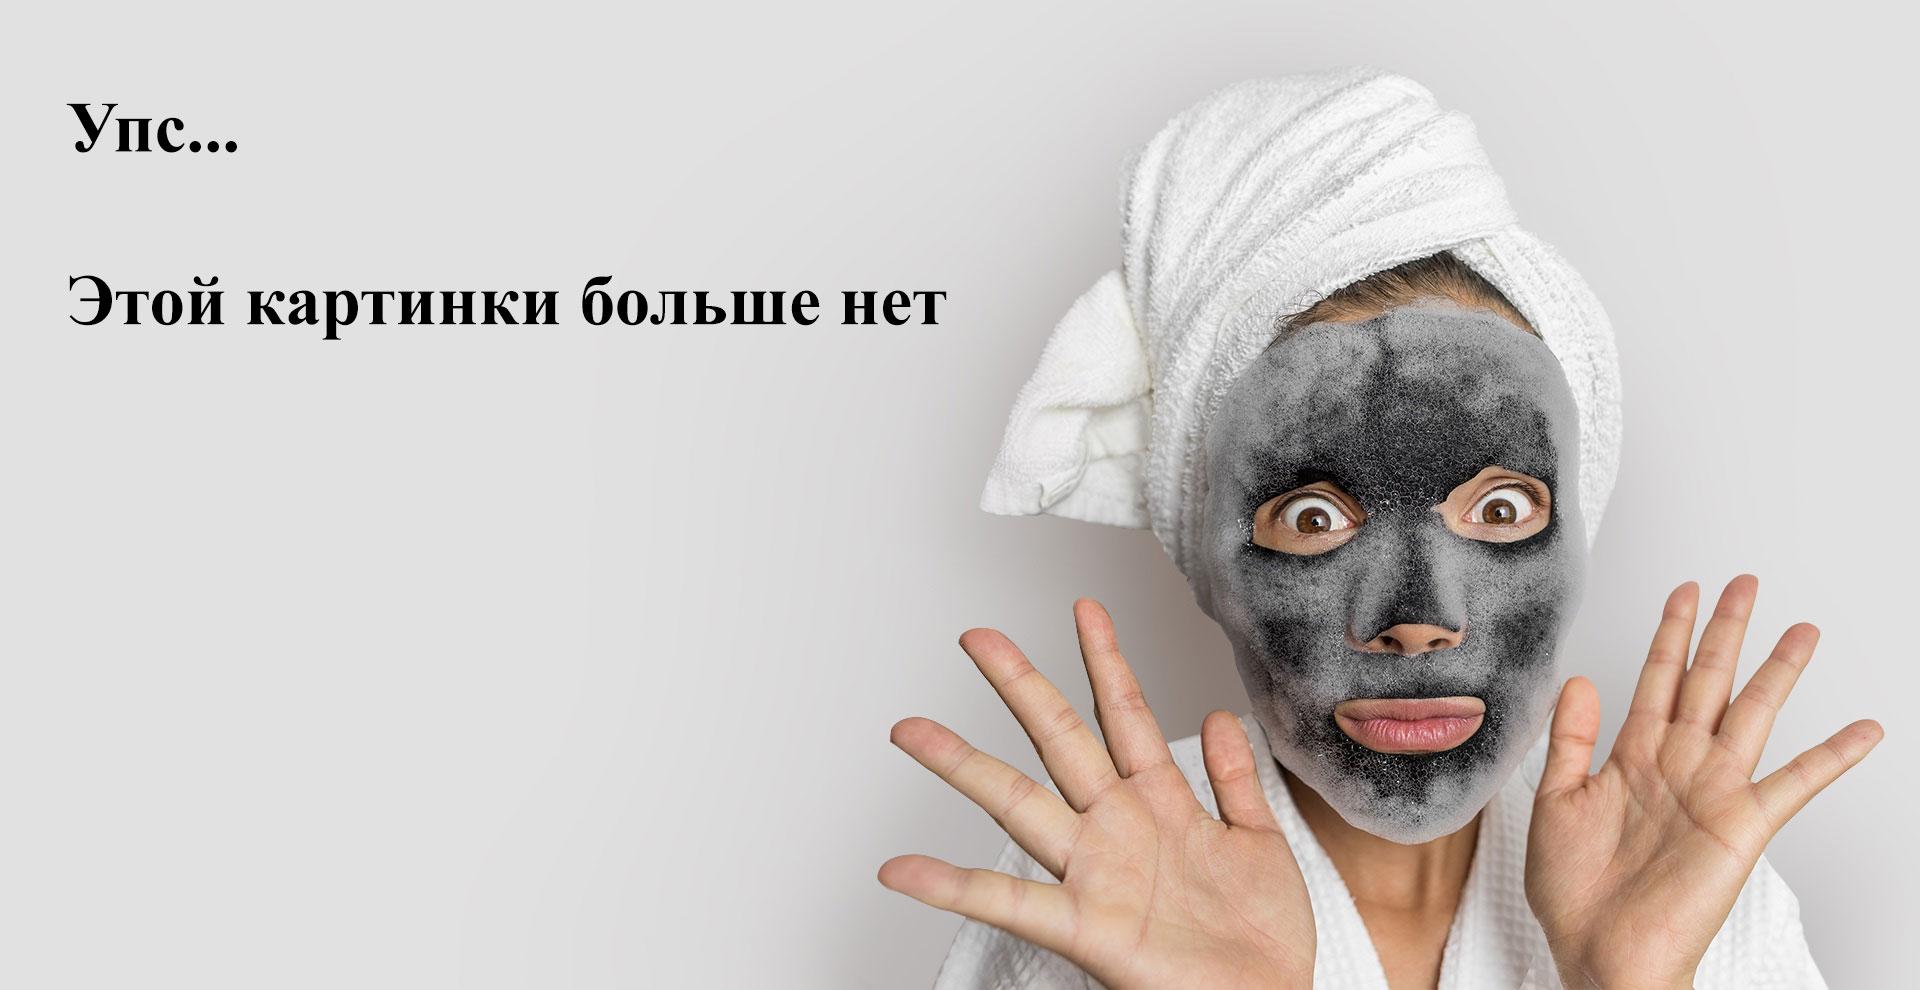 I.C.Lab Individual cosmetic, Крем для лица «Экспресс лифтинг» Age Control, 50 мл